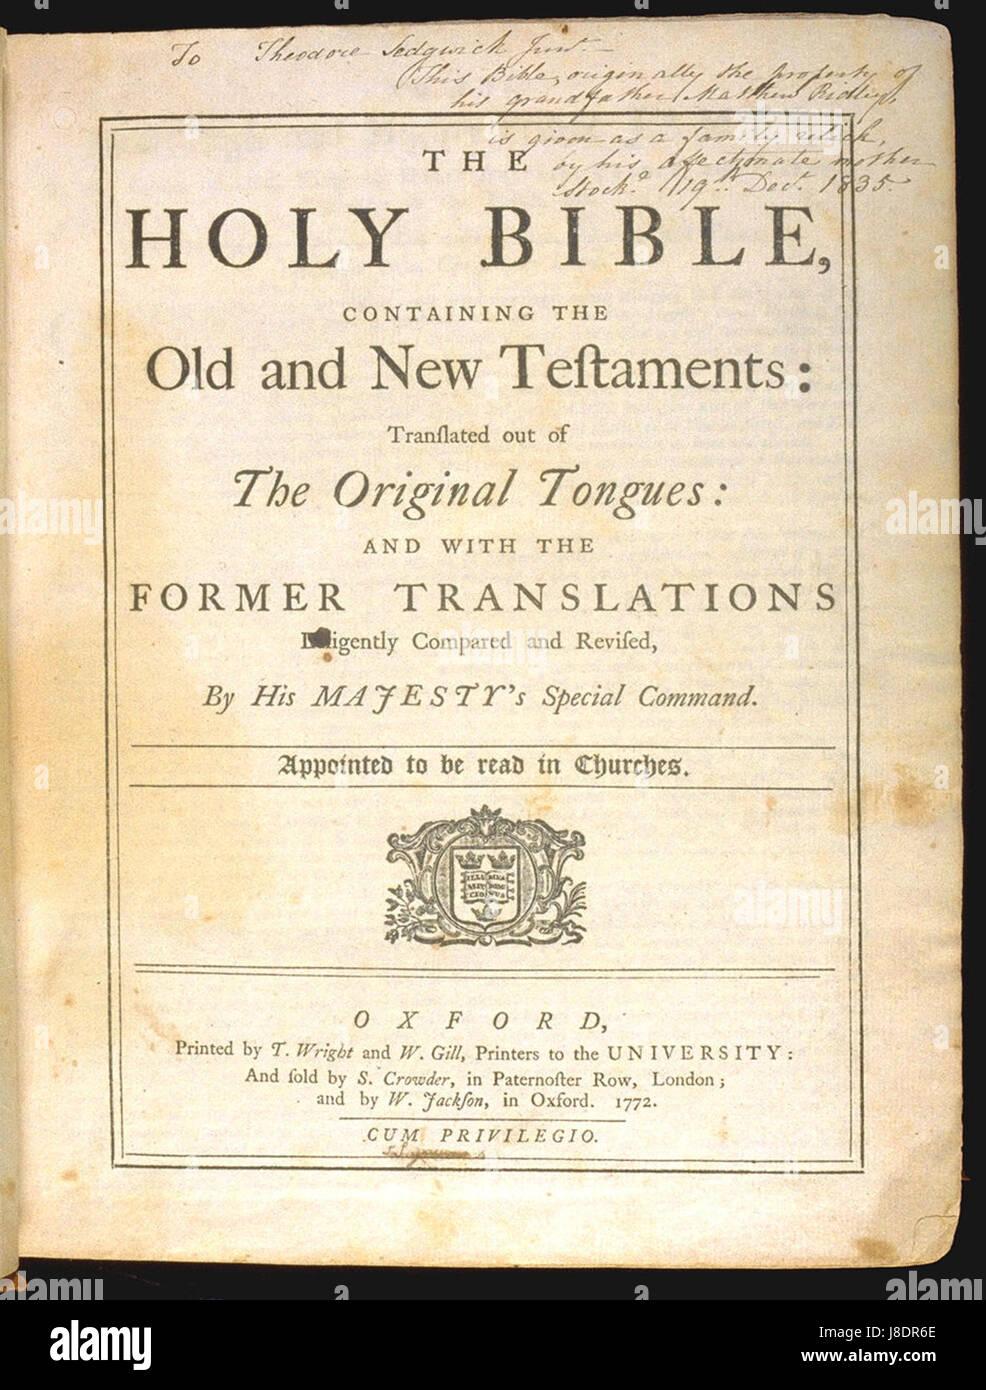 King James Bible 1772 Title page Stock Photo: 142903782 - Alamy